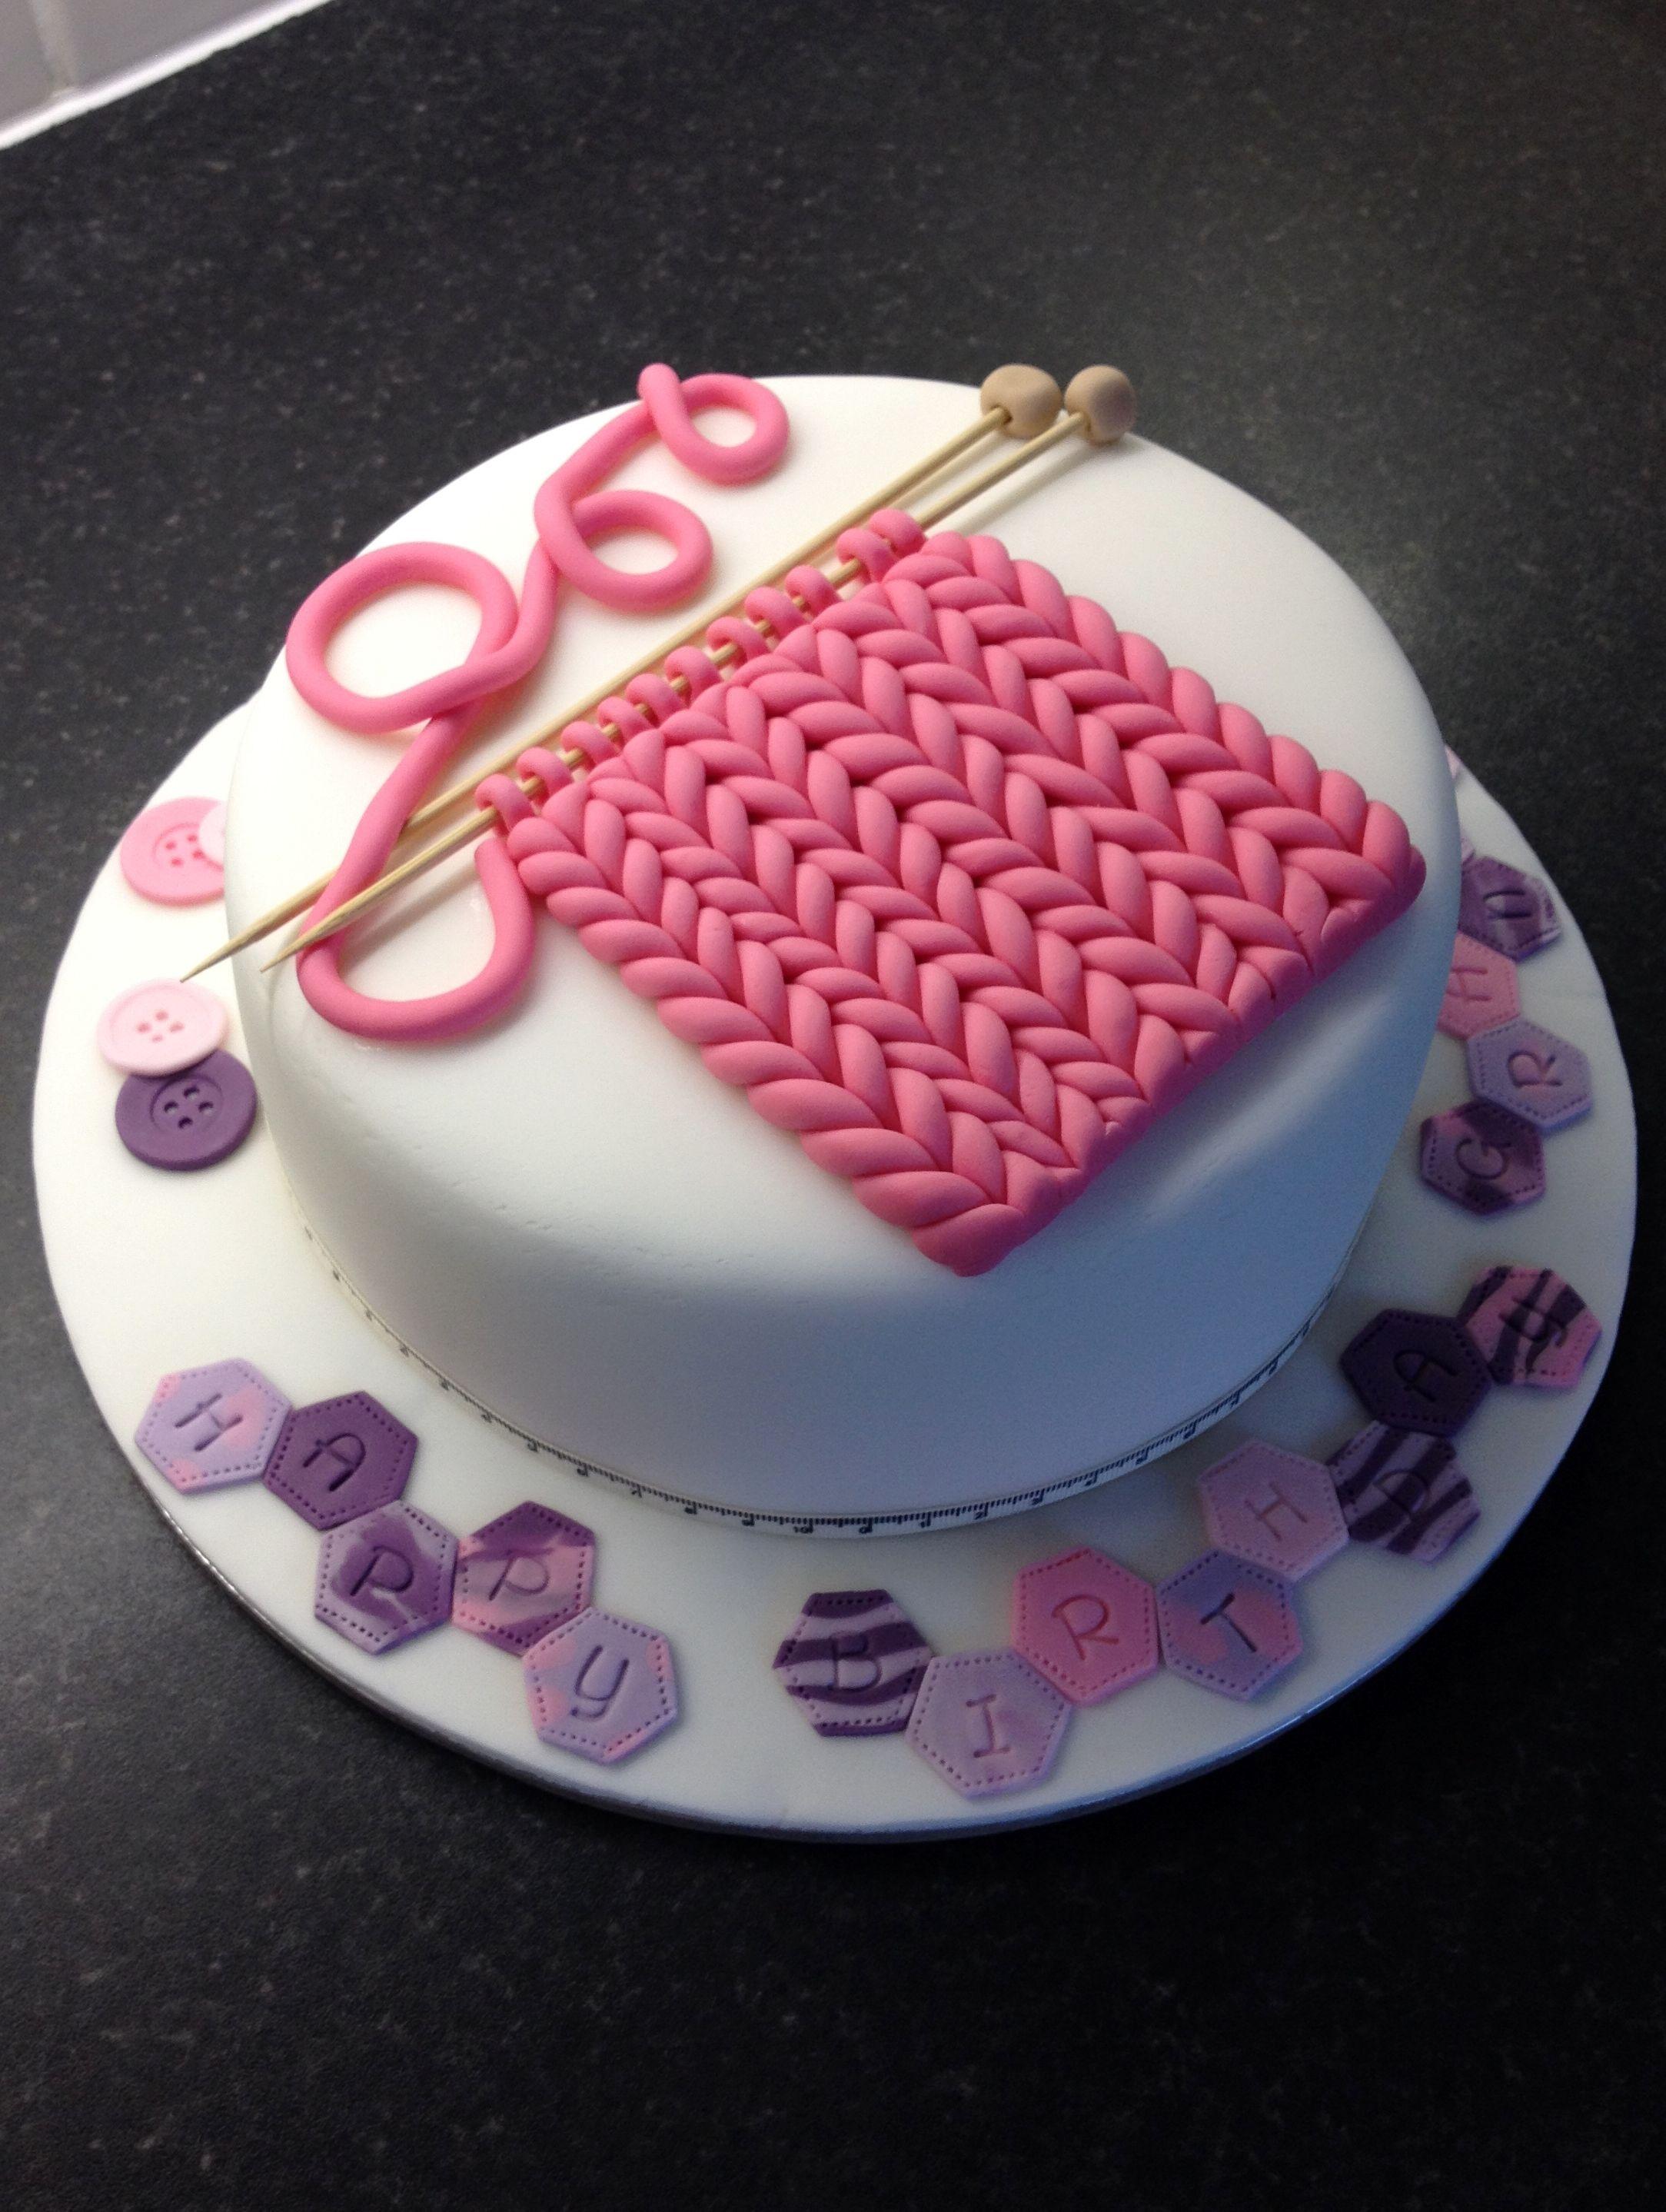 Knitting Cake Tutorial : Knitting cake fondant tutorials pinterest